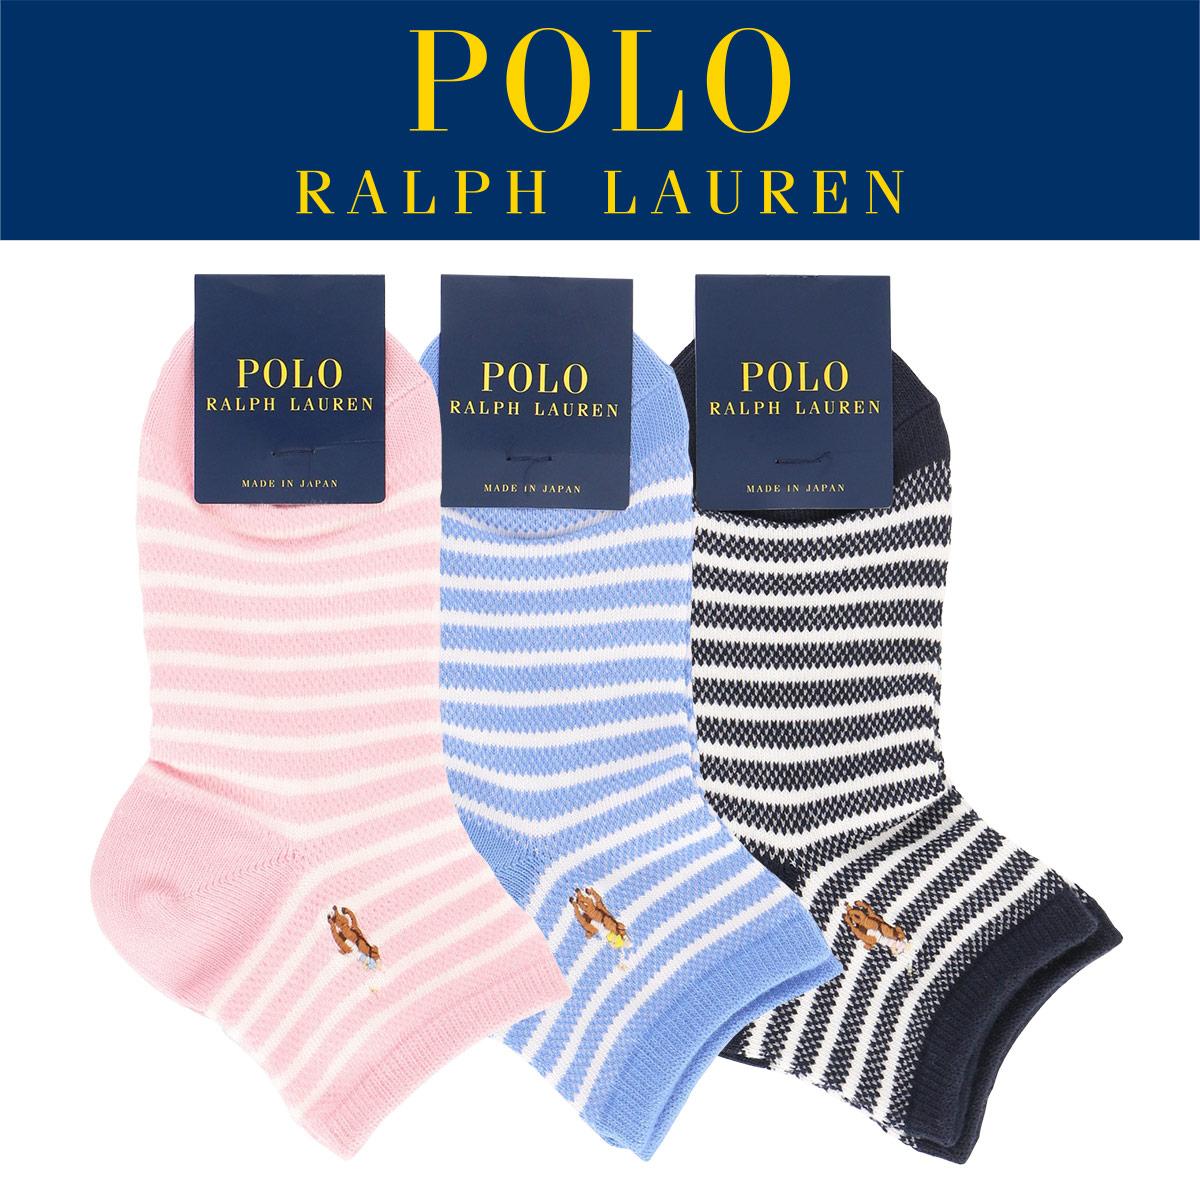 POLO RALPH LAUREN ポロ ラルフローレン|キッズ ジュニア 子供 ガールズ 女の子 靴下| ワンポイント刺繍|オックスフォードストライプ柄|スニーカーソックス|4803-684【ゆうパケット・4点まで】